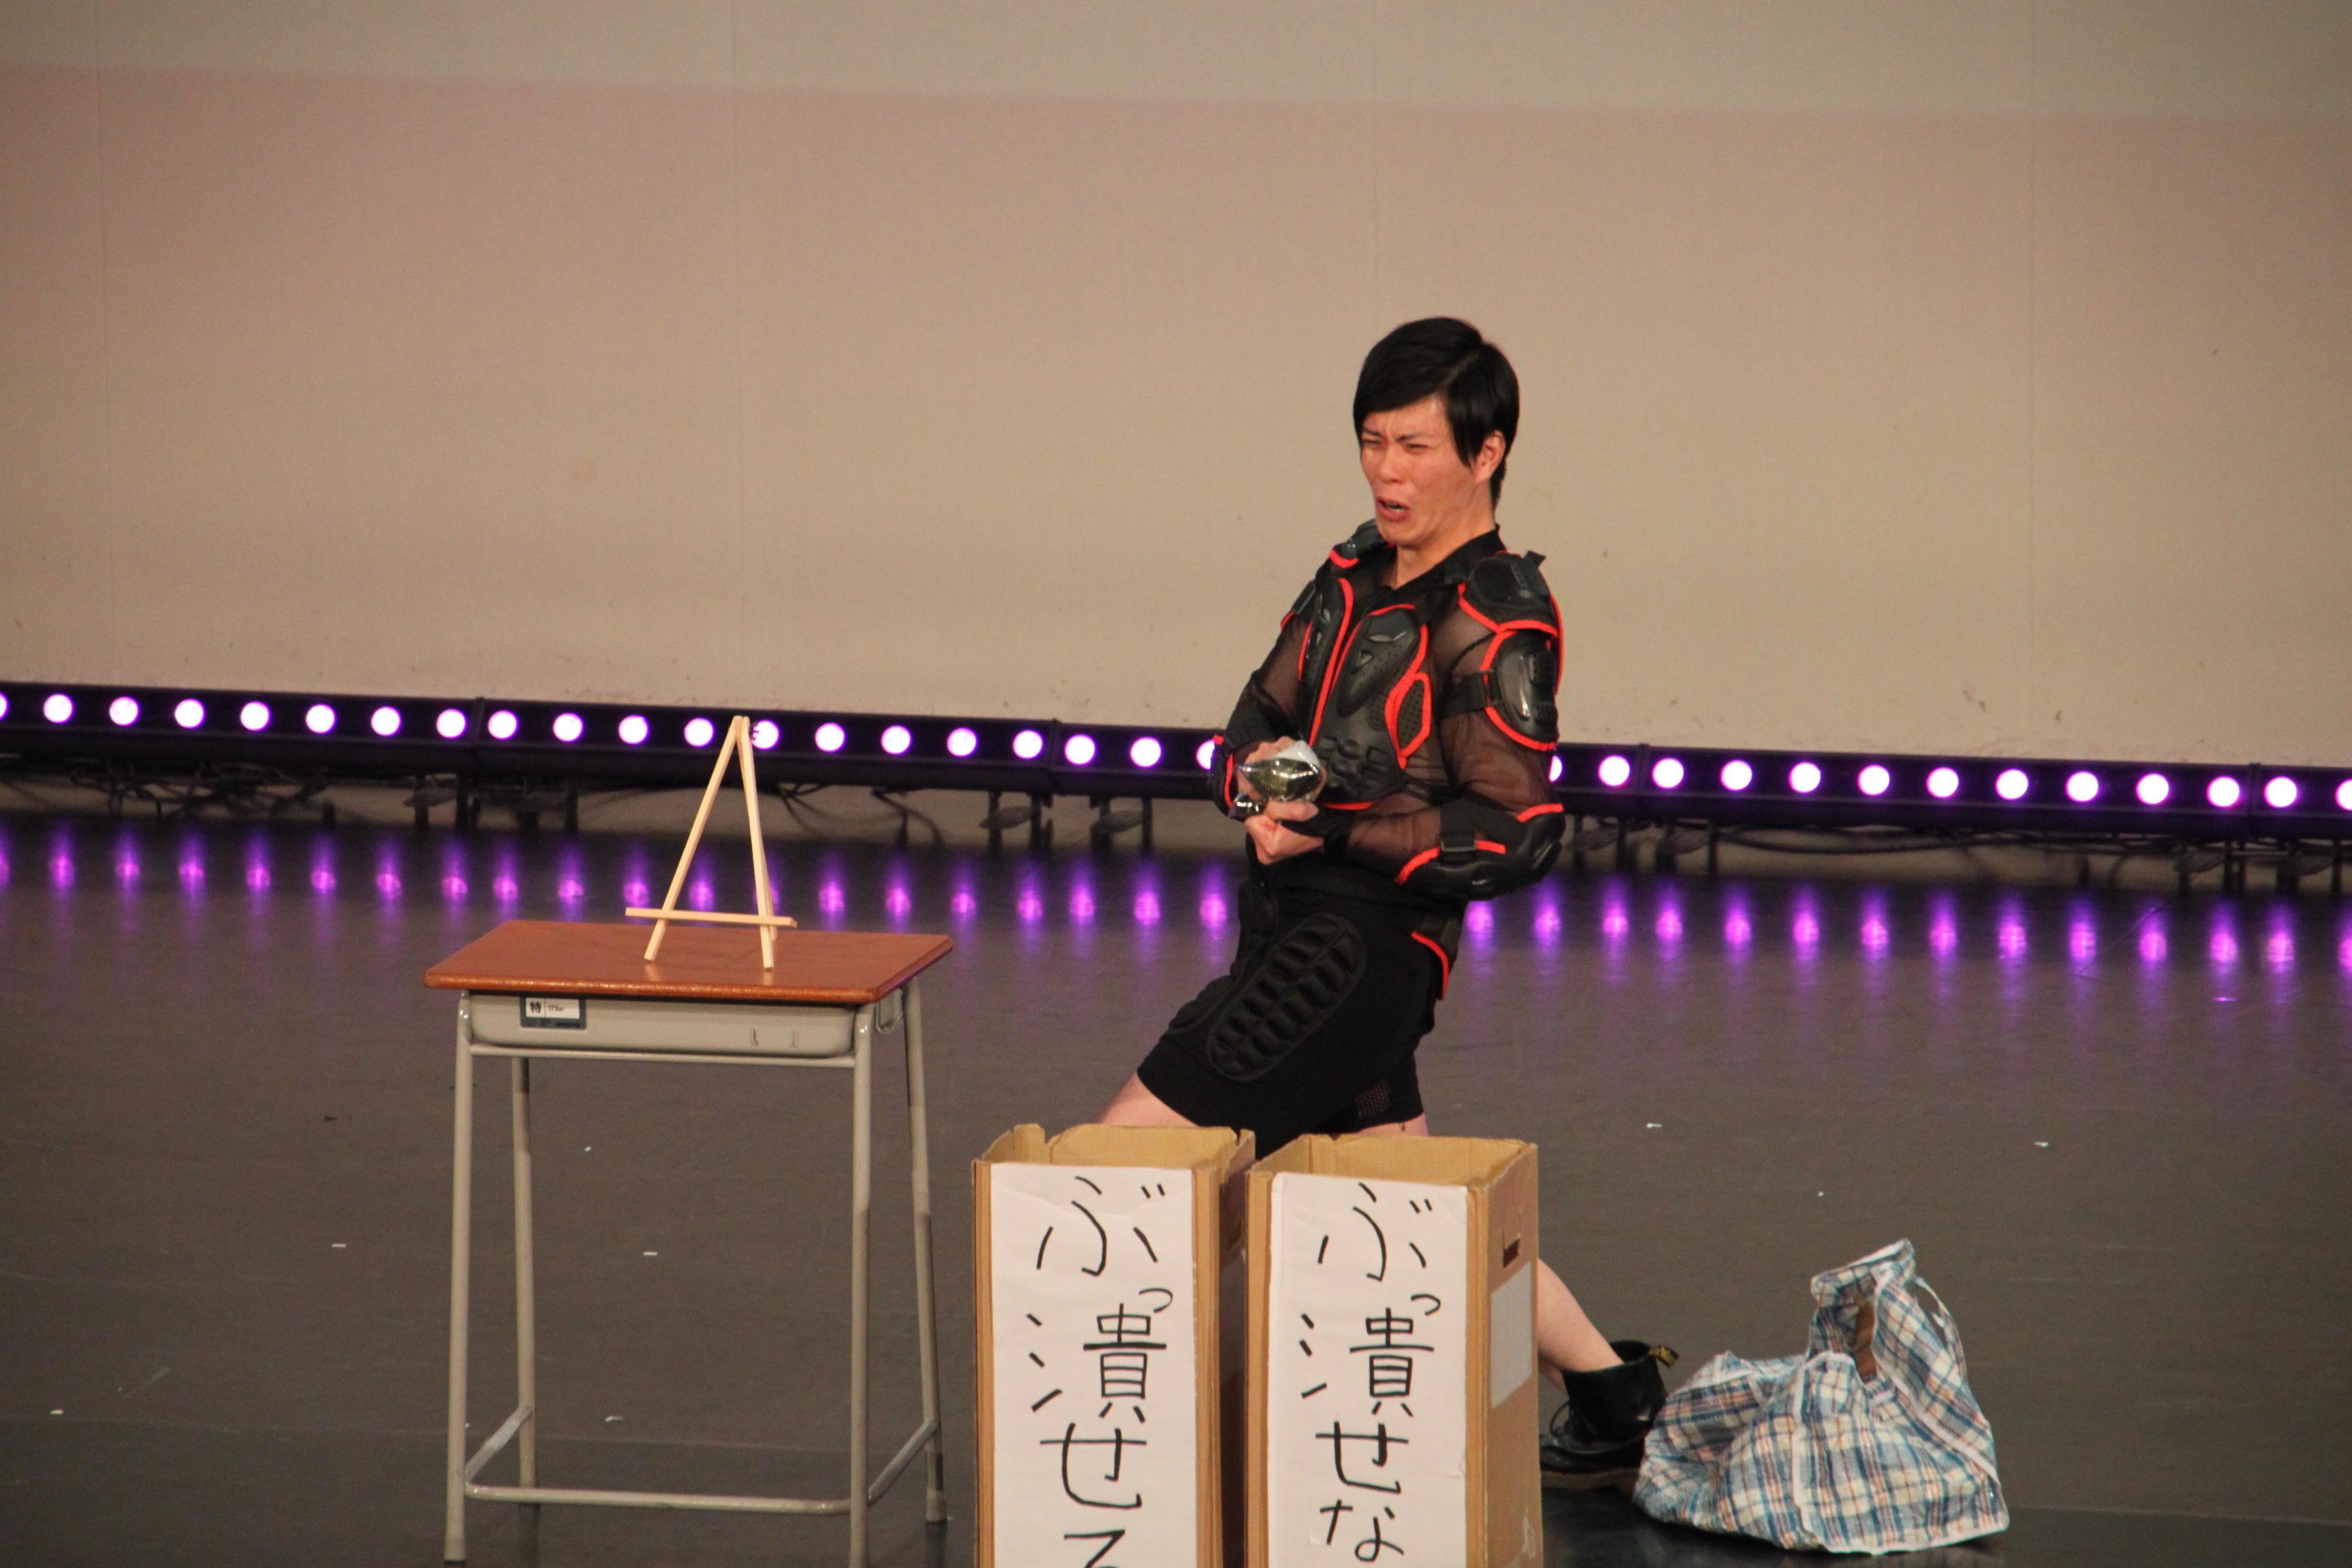 http://news.yoshimoto.co.jp/20181222235955-ce682e8519852e014bb3613f0152b59a3267a347.jpg